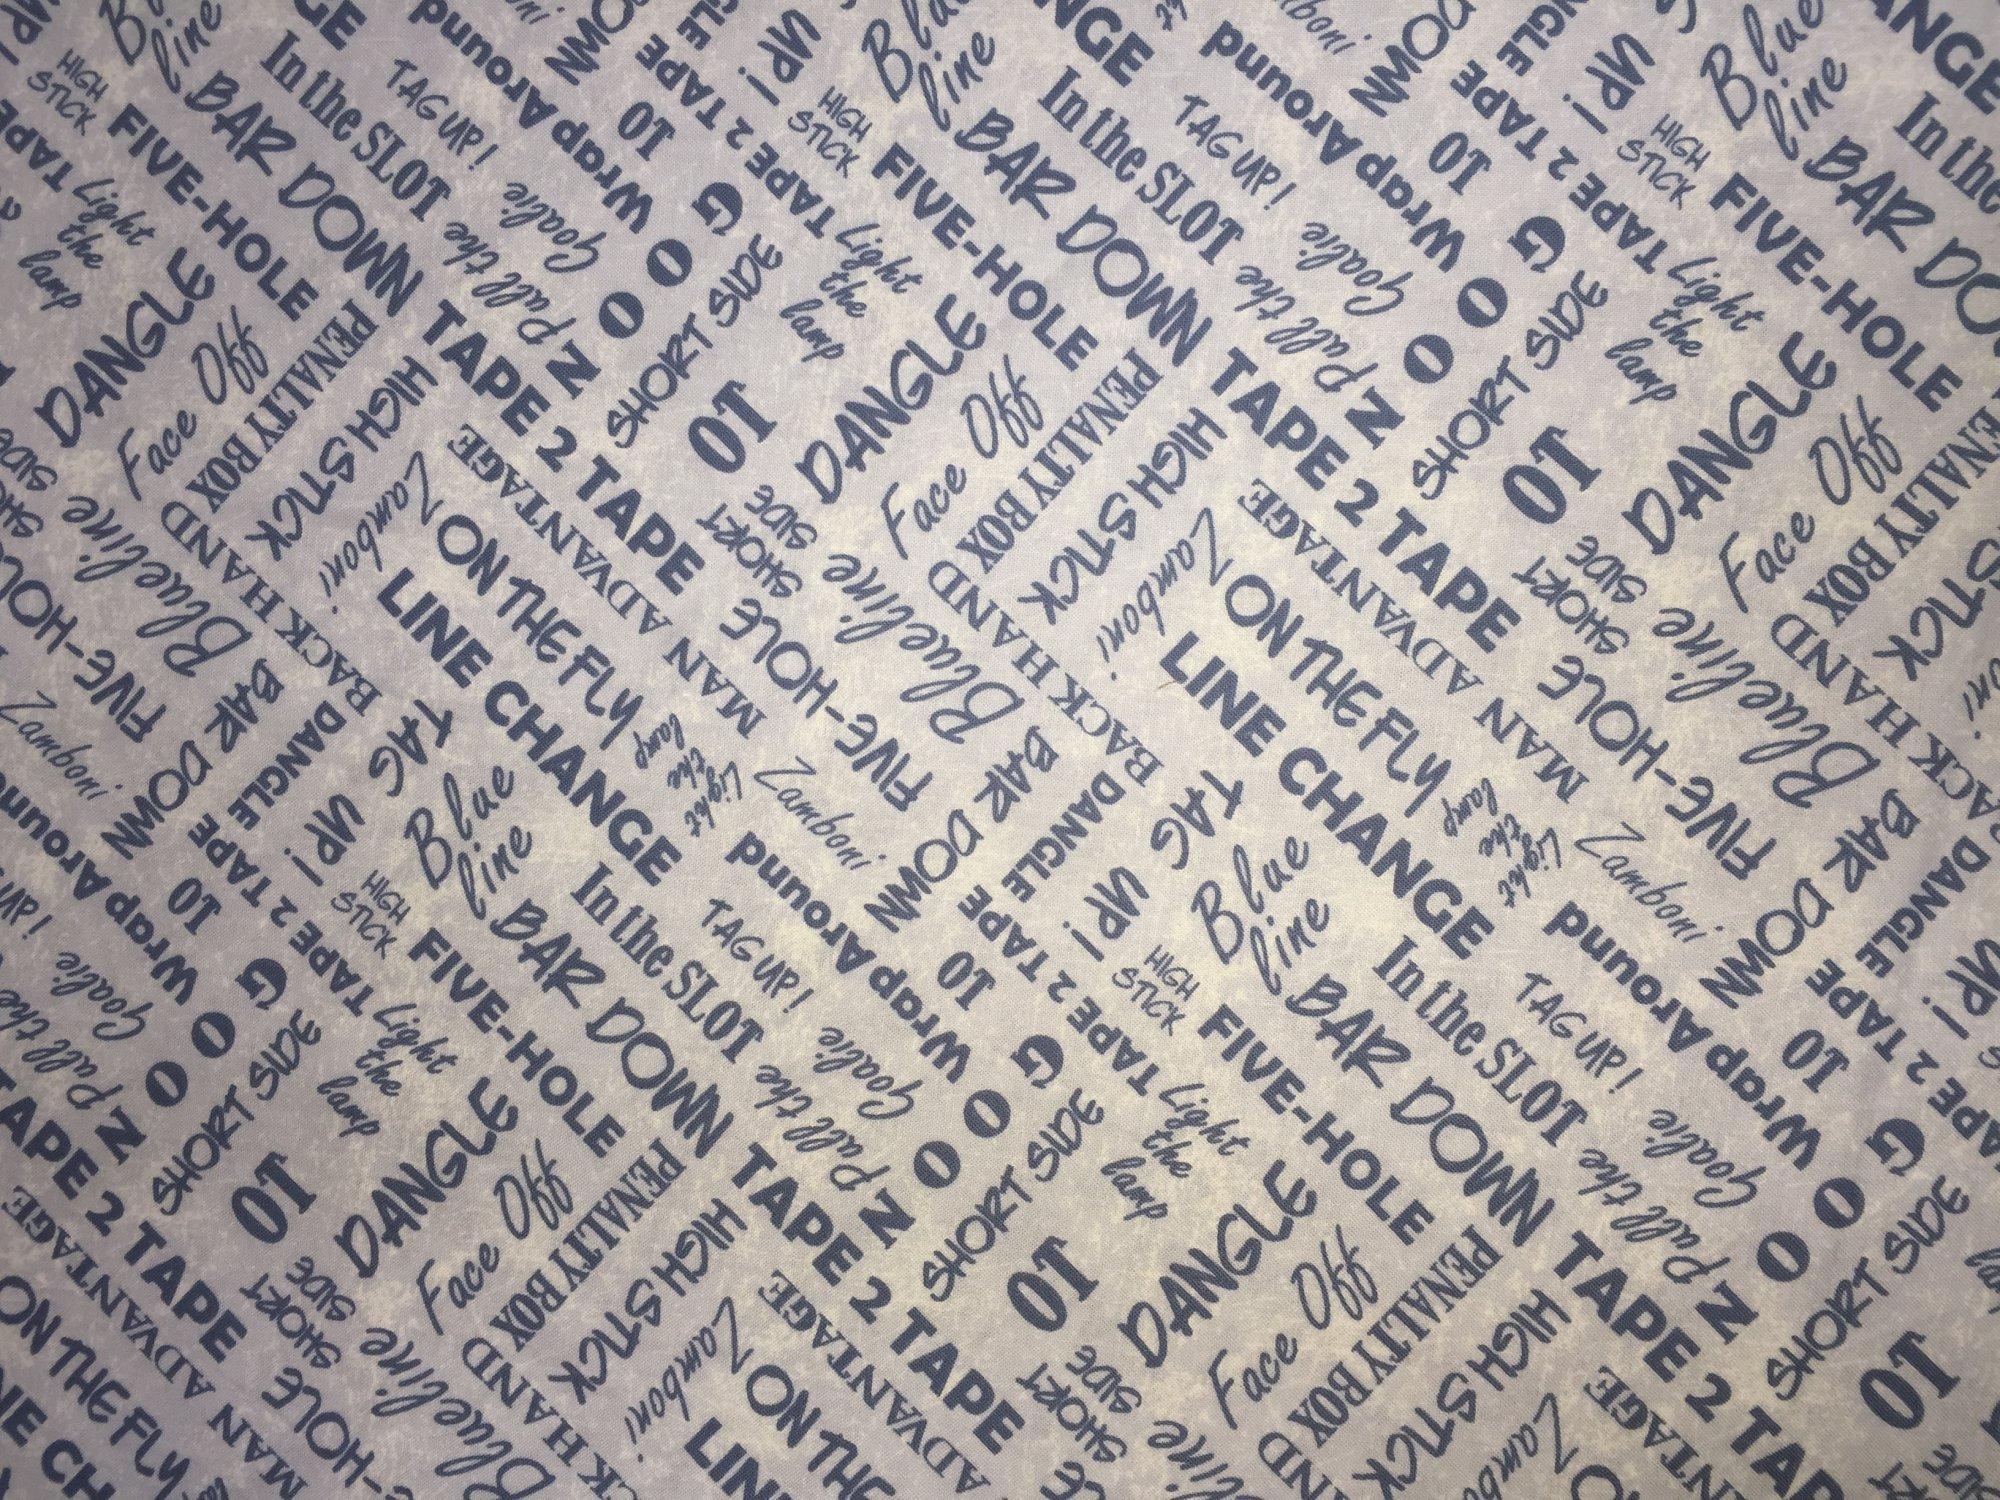 Pond Hockey - Words Quilt Fabric